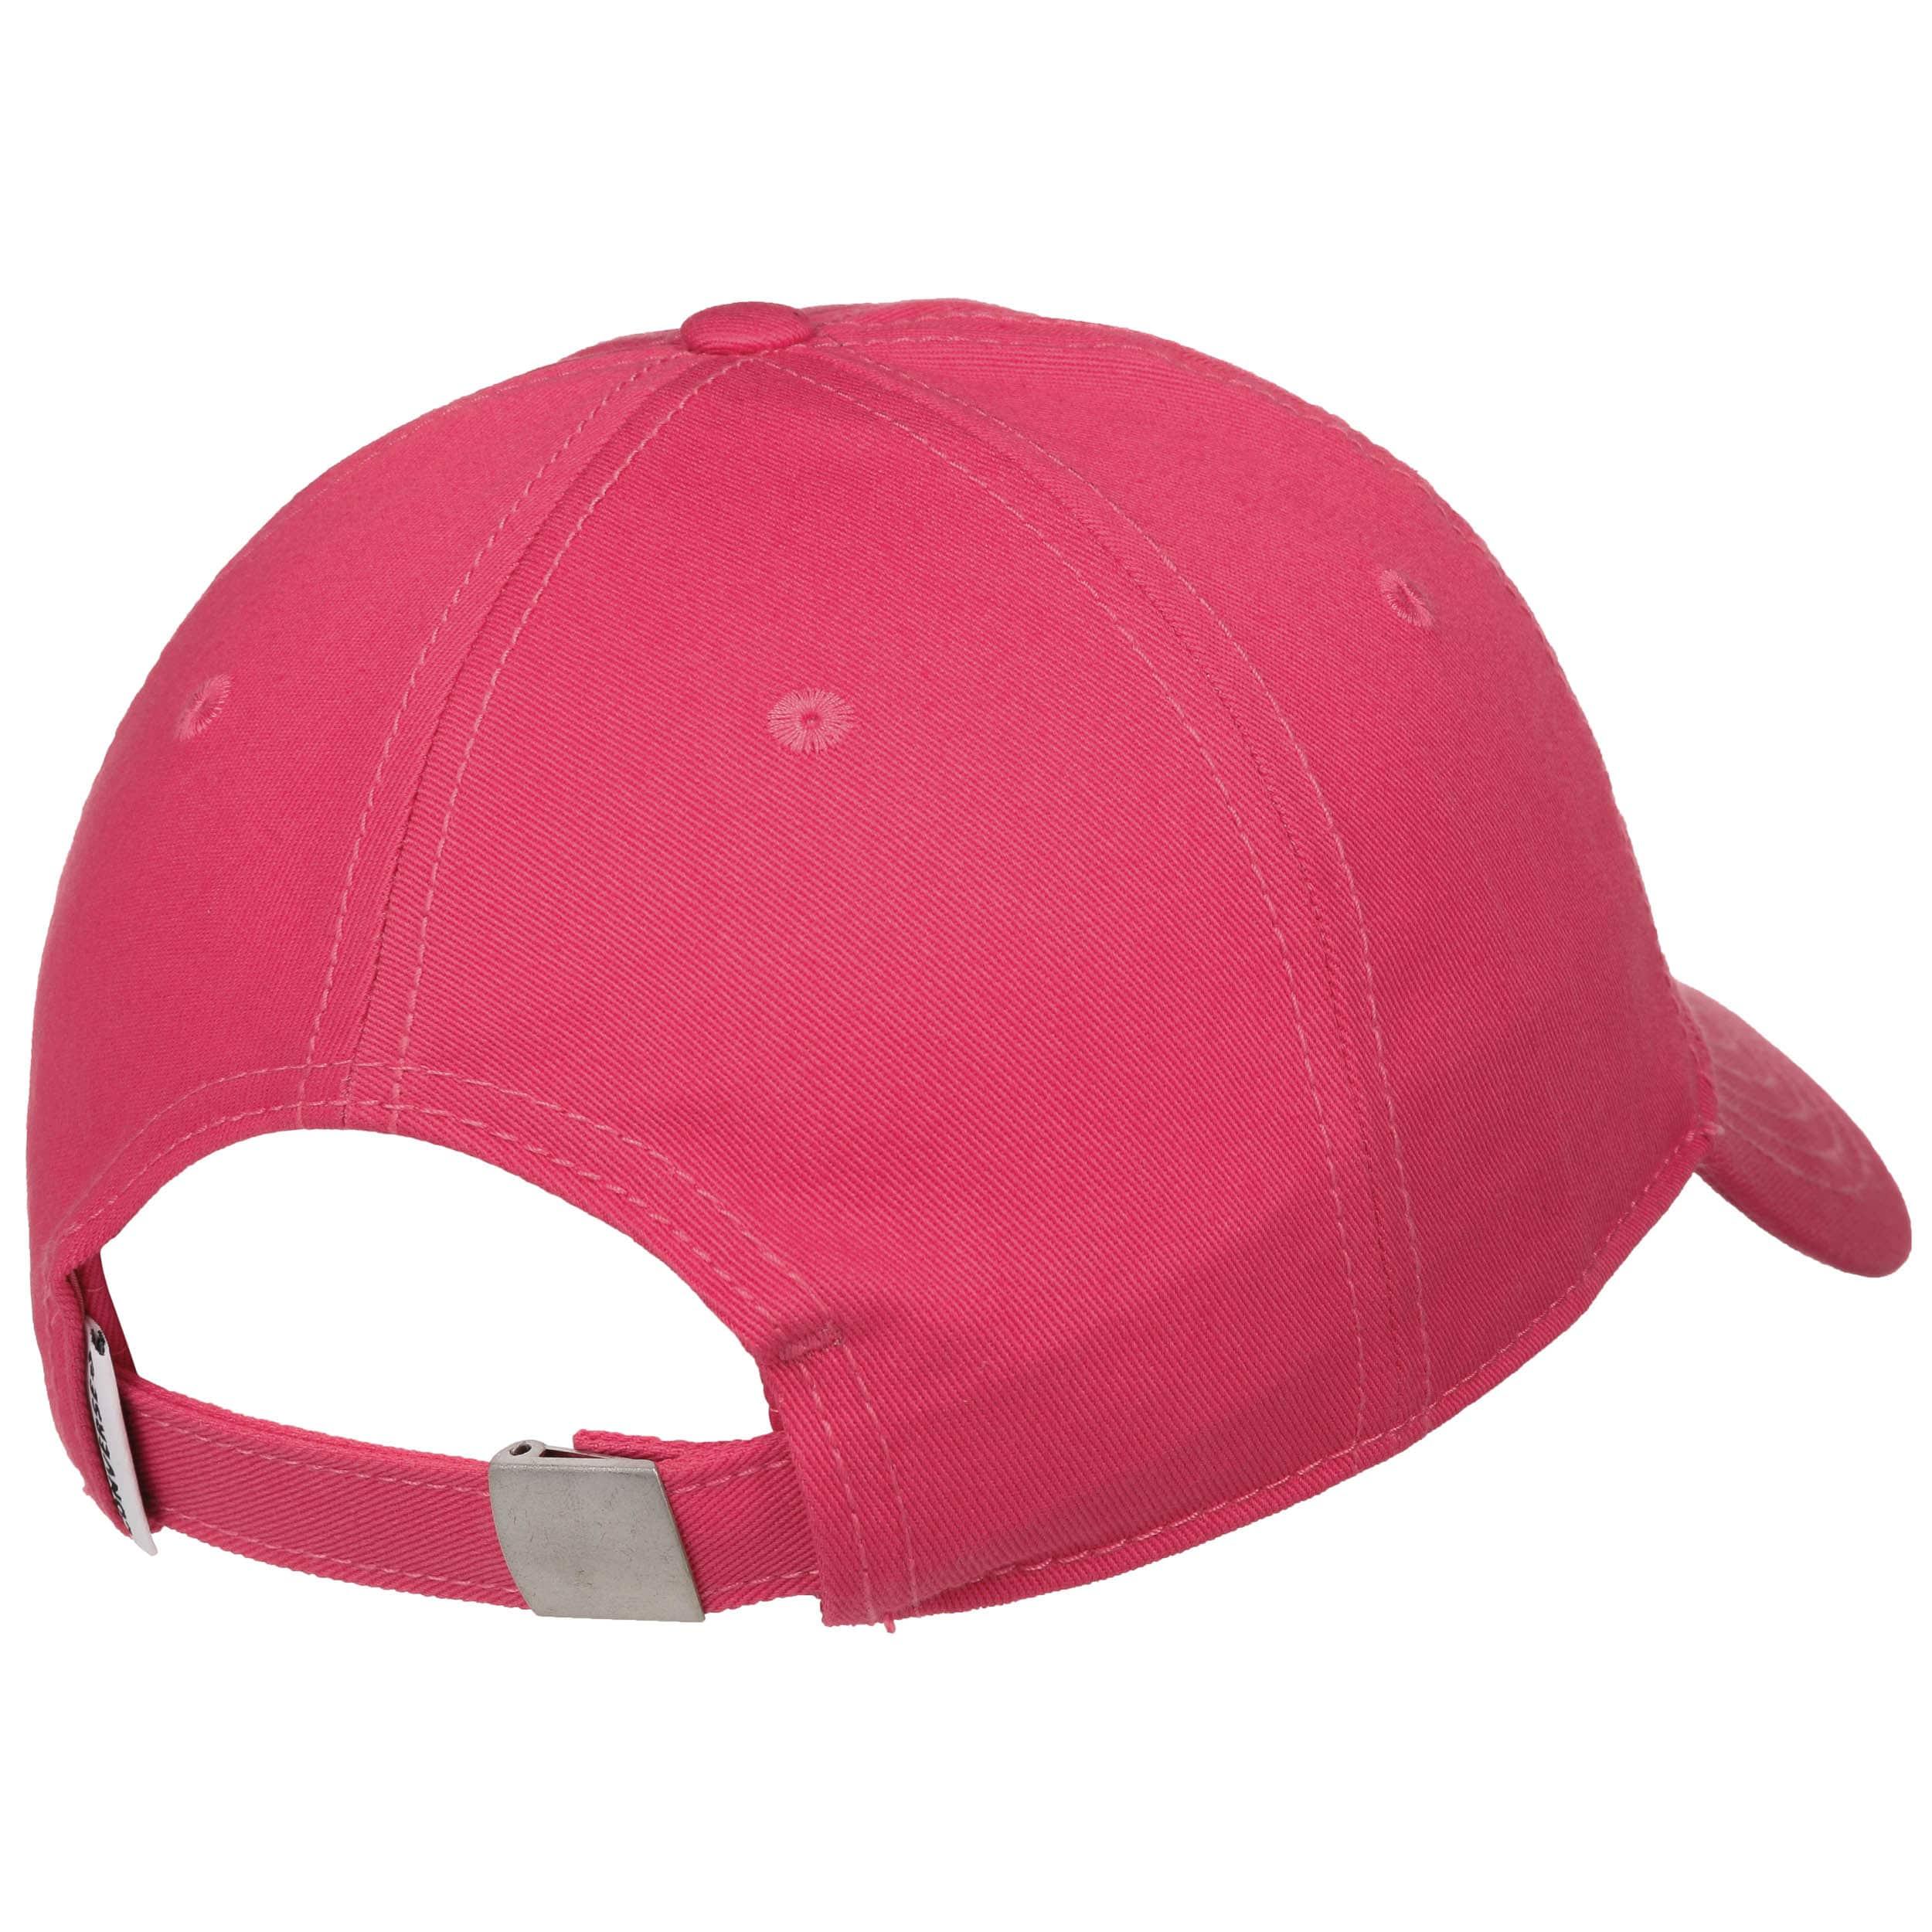 c8e4759f274 ... Core Classic Baseball Cap by Converse - pink 3 ...